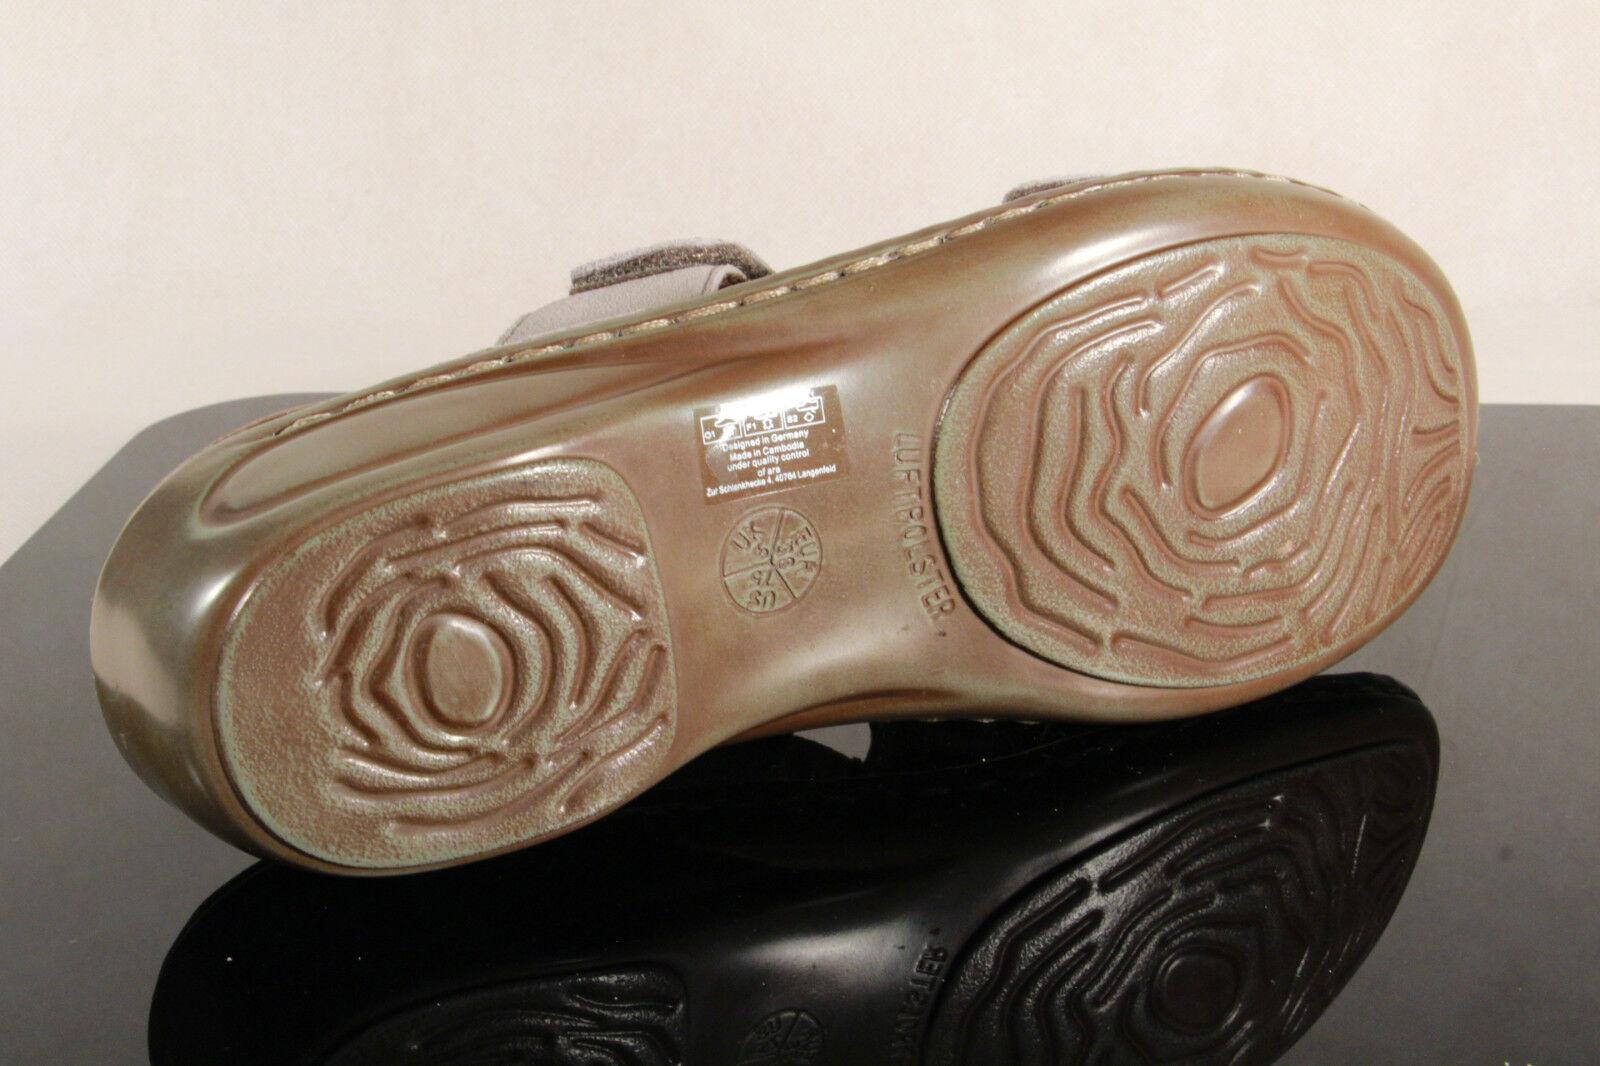 Ara Pelle Sandali Sandali Pantofole Zoccoli Pantofole in Vera Pelle Ara Grigio 27273 NUOVO! 94615d